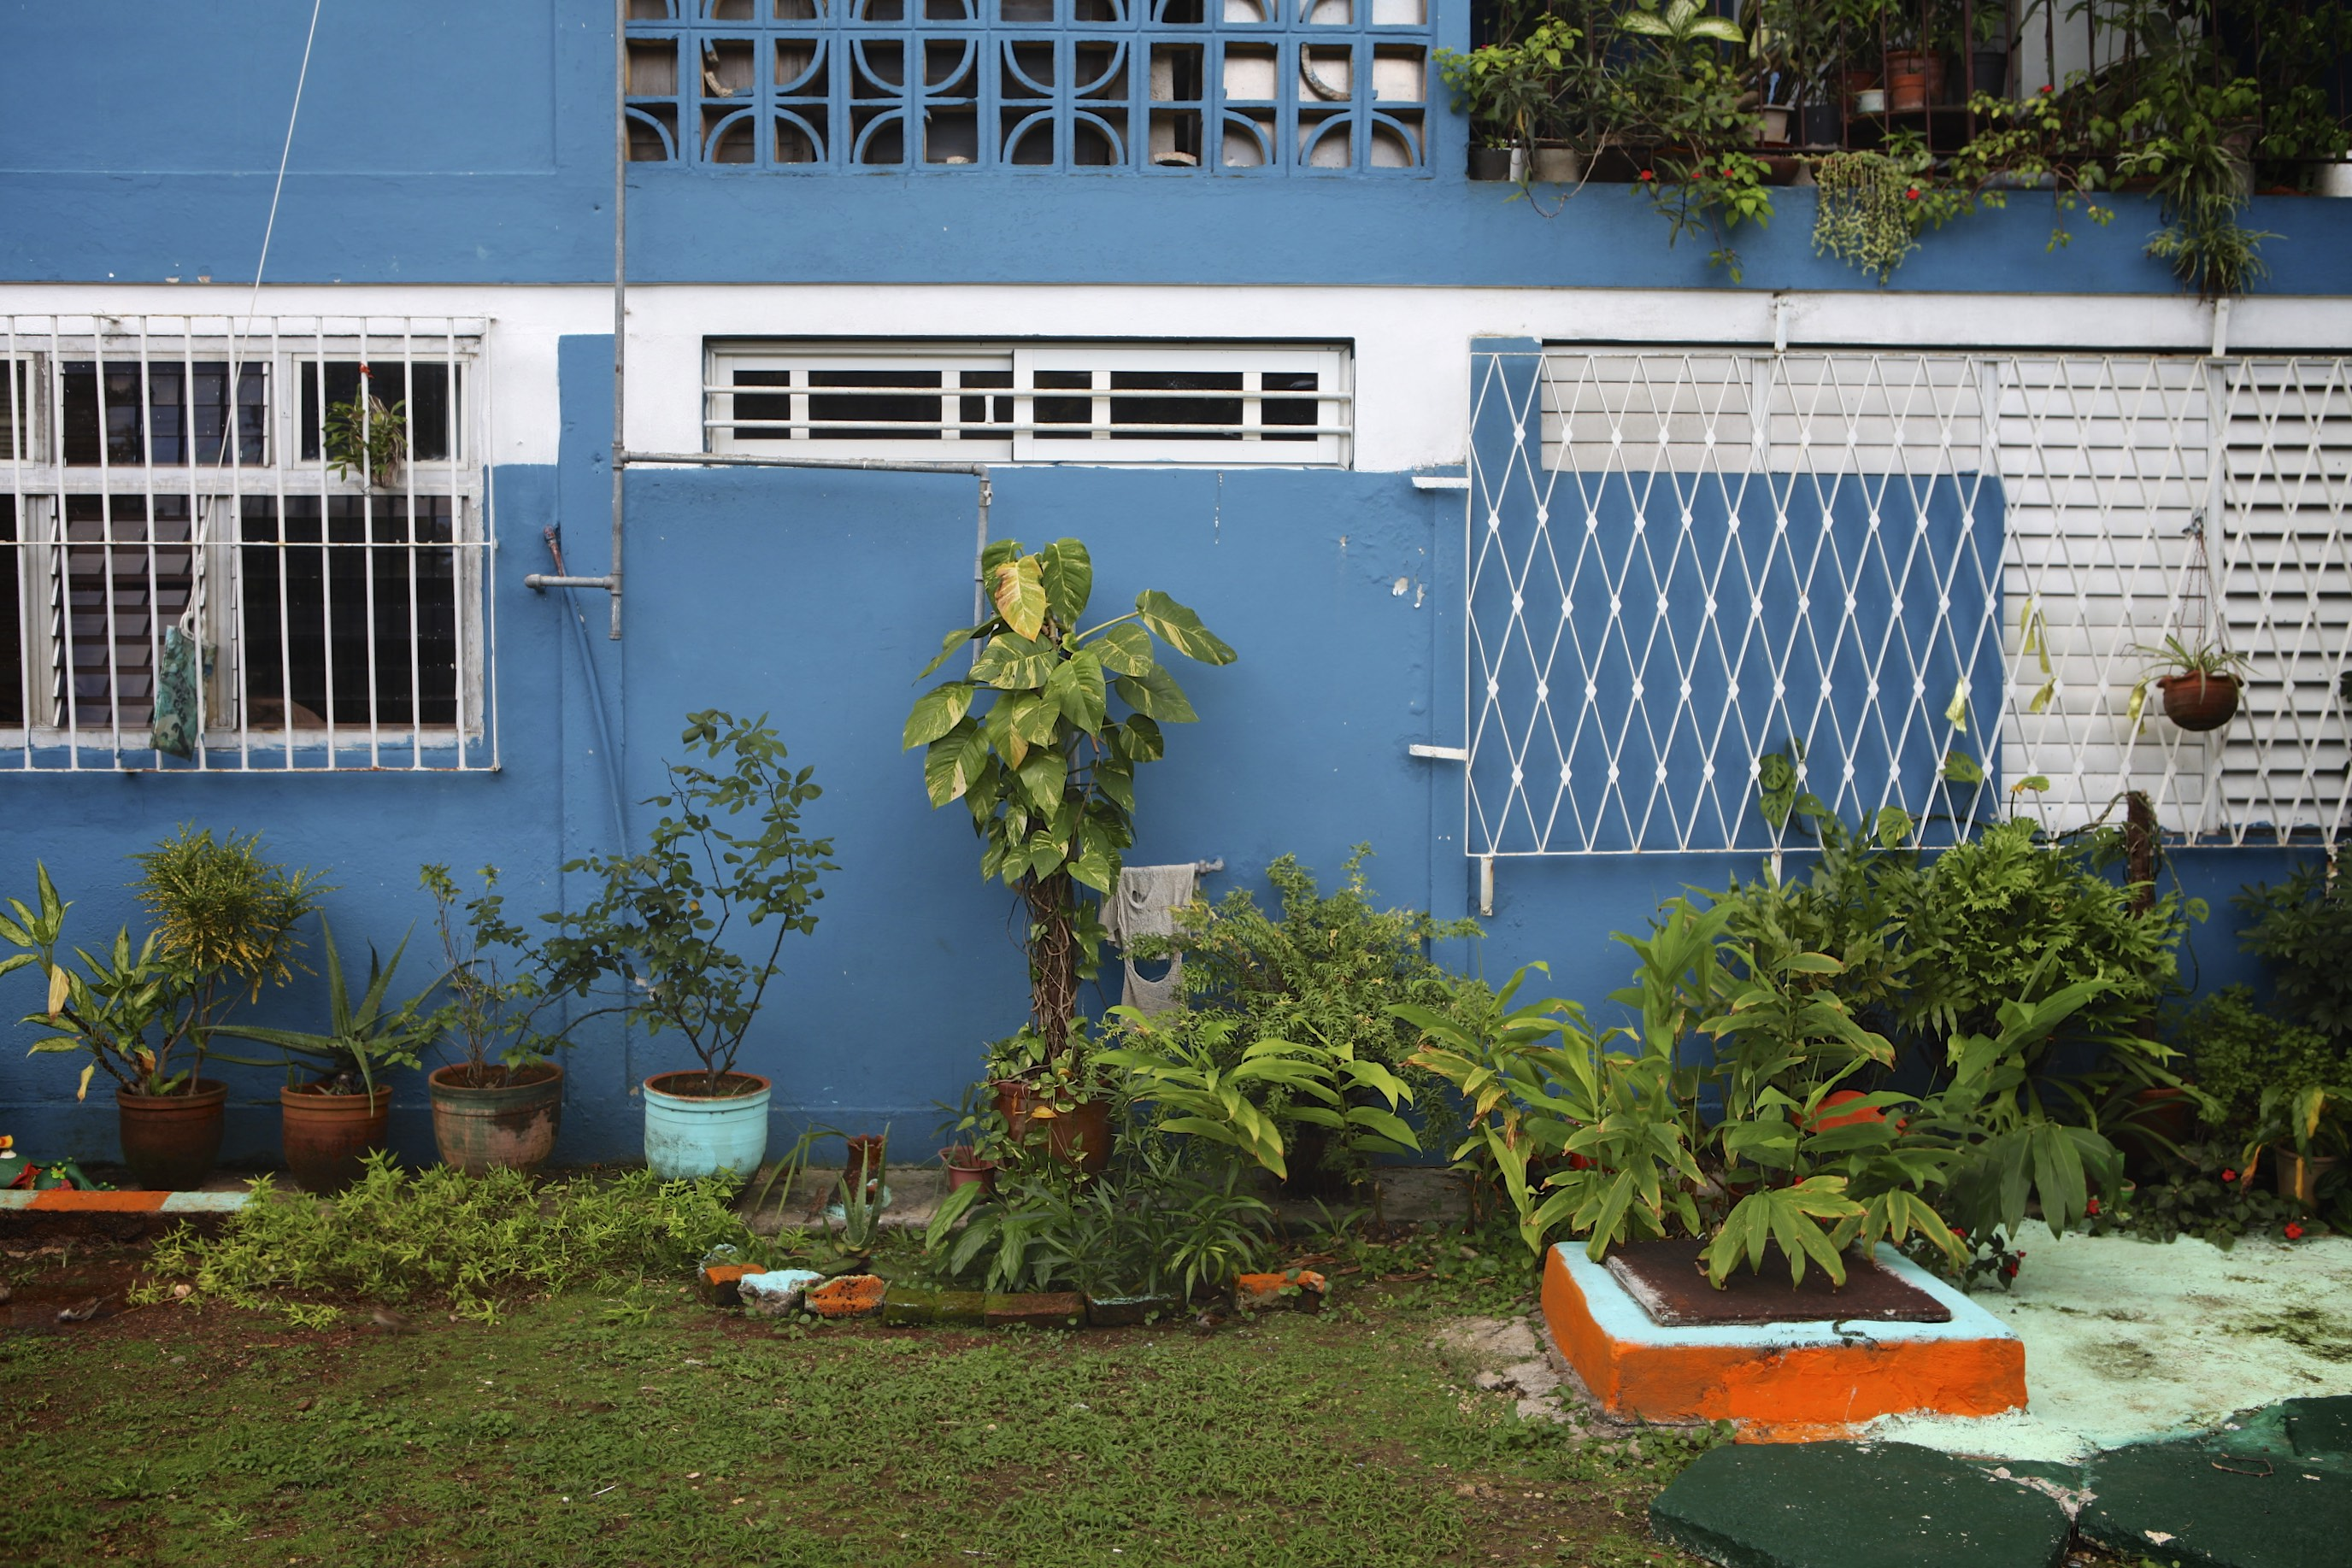 Garden: Eladio Cid